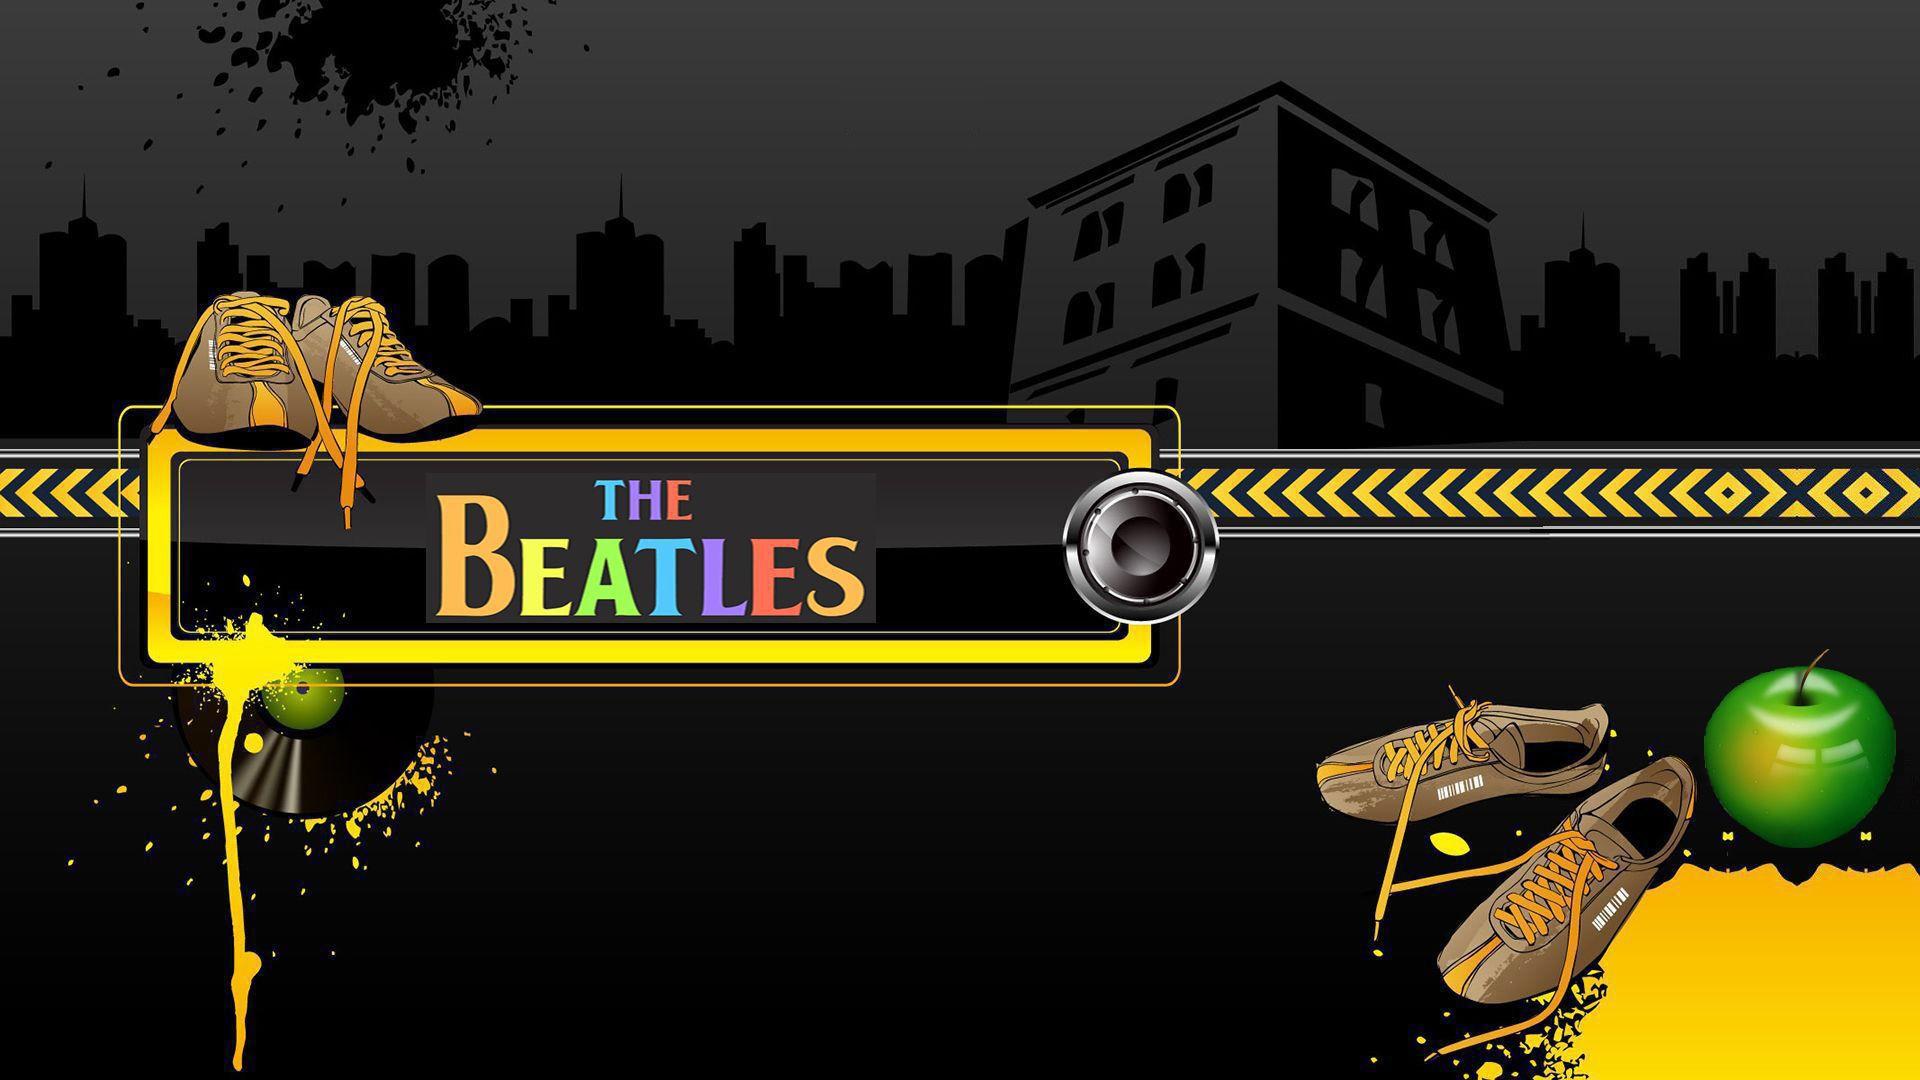 Fall Stars Wallpaper The Beatles Border Hd Wallpapers Pixelstalk Net